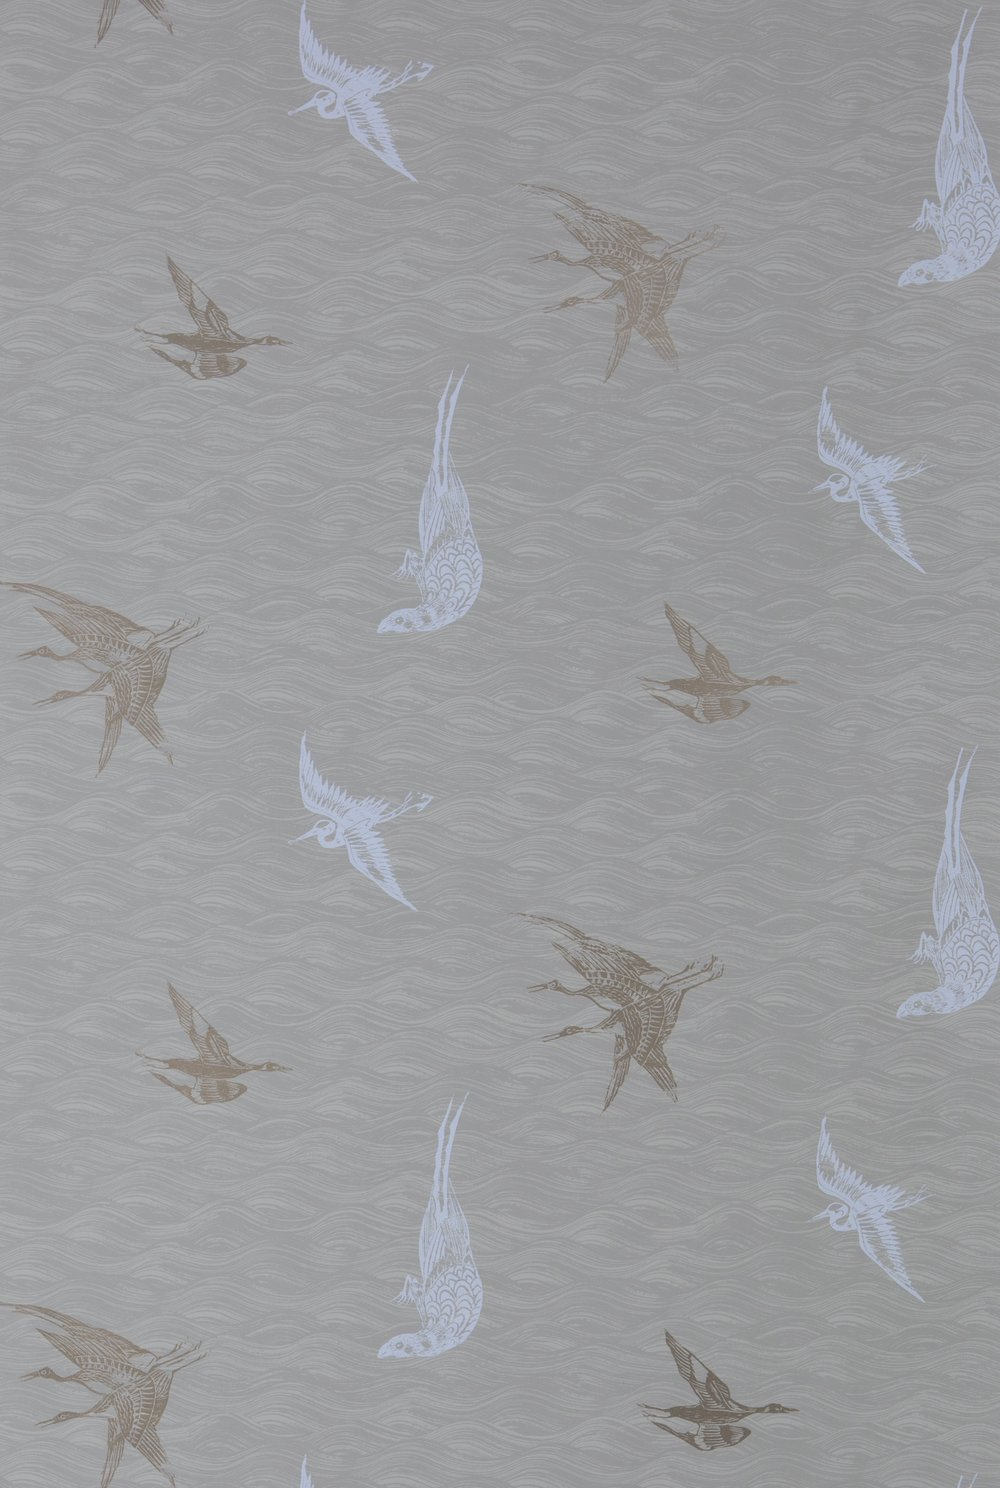 BIRDS I DUNE